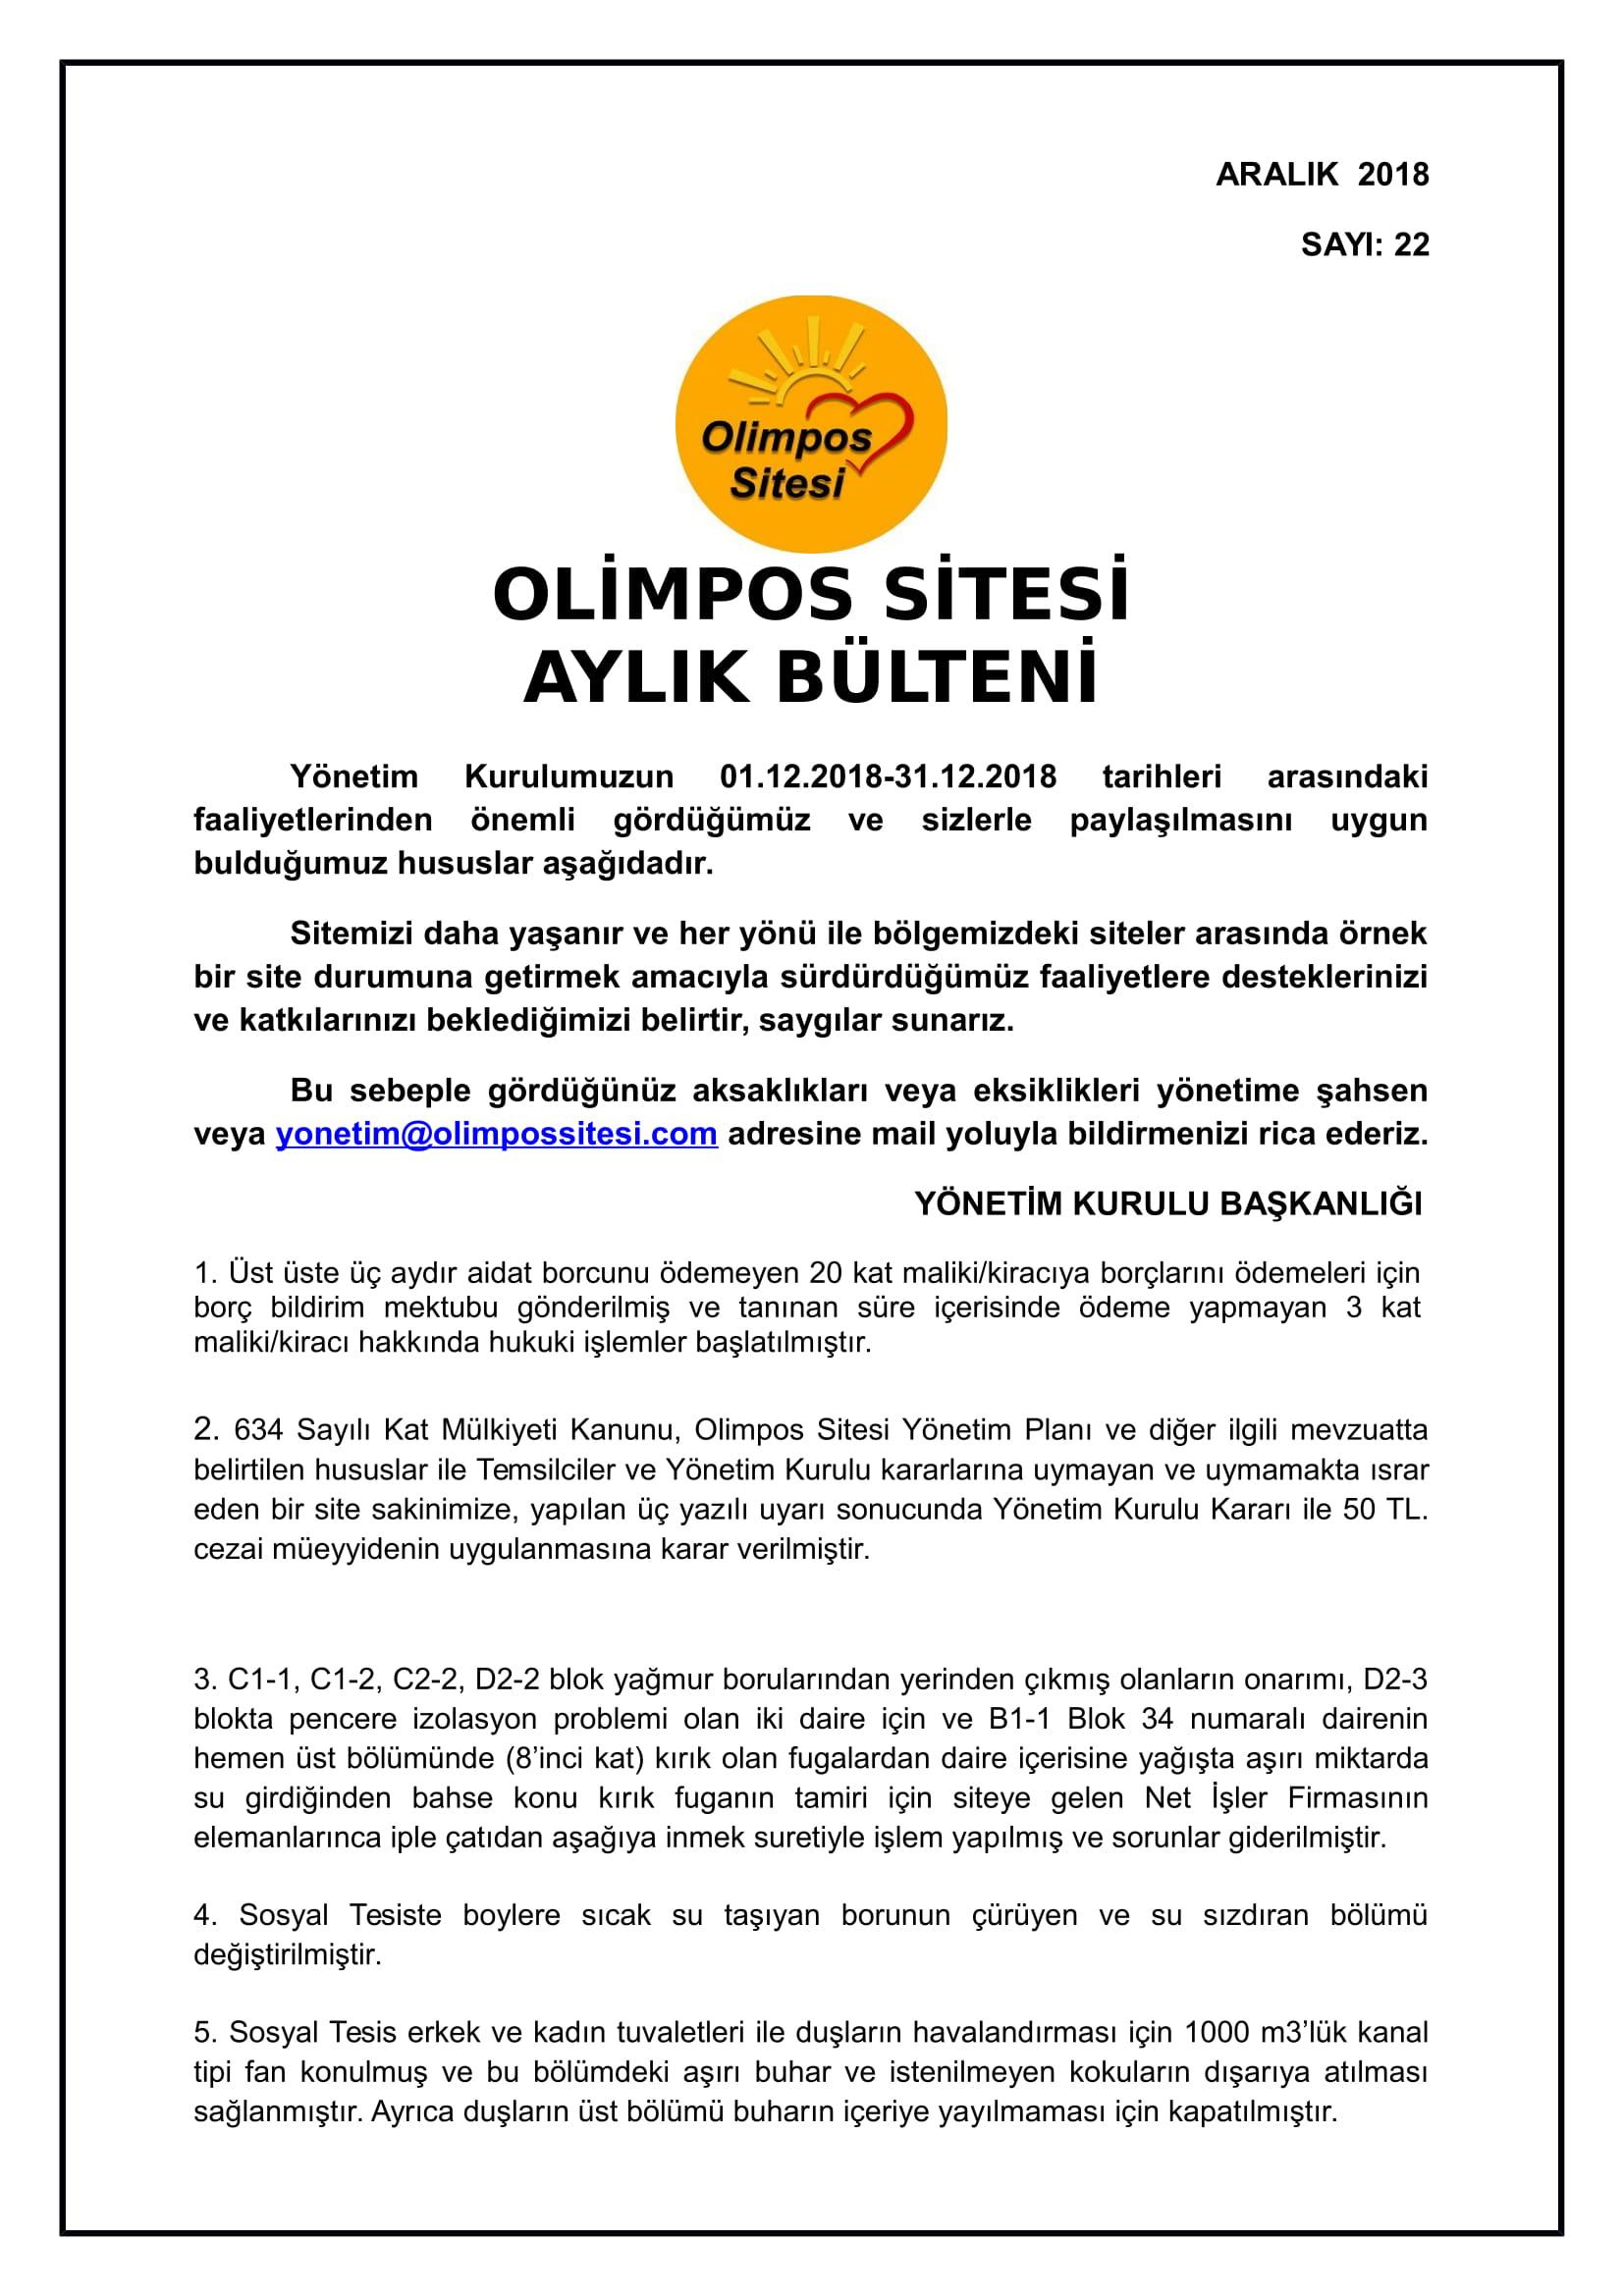 22-01.12.2018 ARALIK-2018 BÜLTEN (1)-1